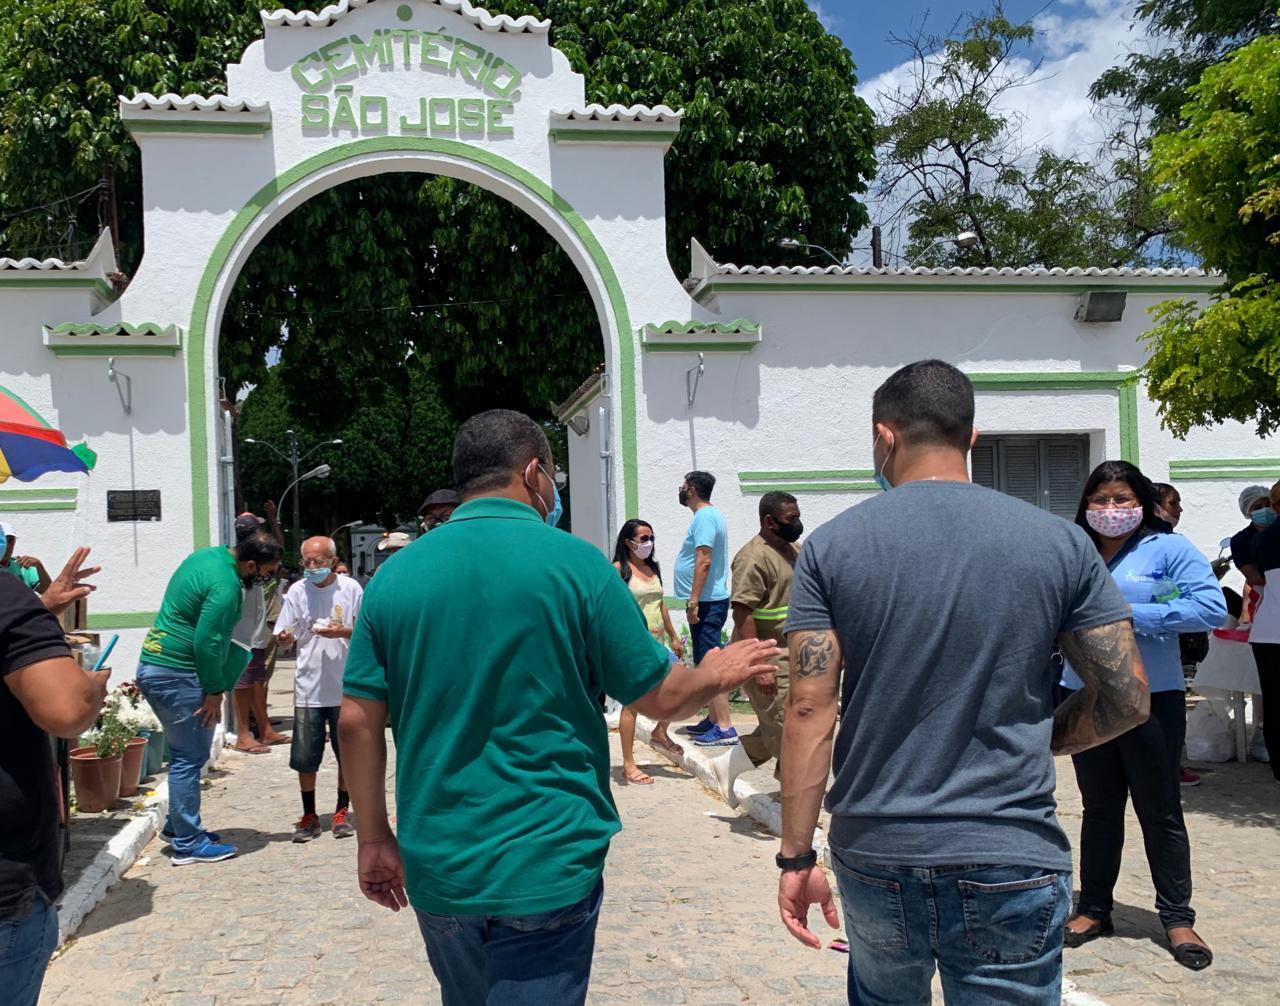 WhatsApp Image 2020 11 02 at 12.49.16 - No dia de Finados, Nilvan anuncia que vai reformar cemitérios da Capital